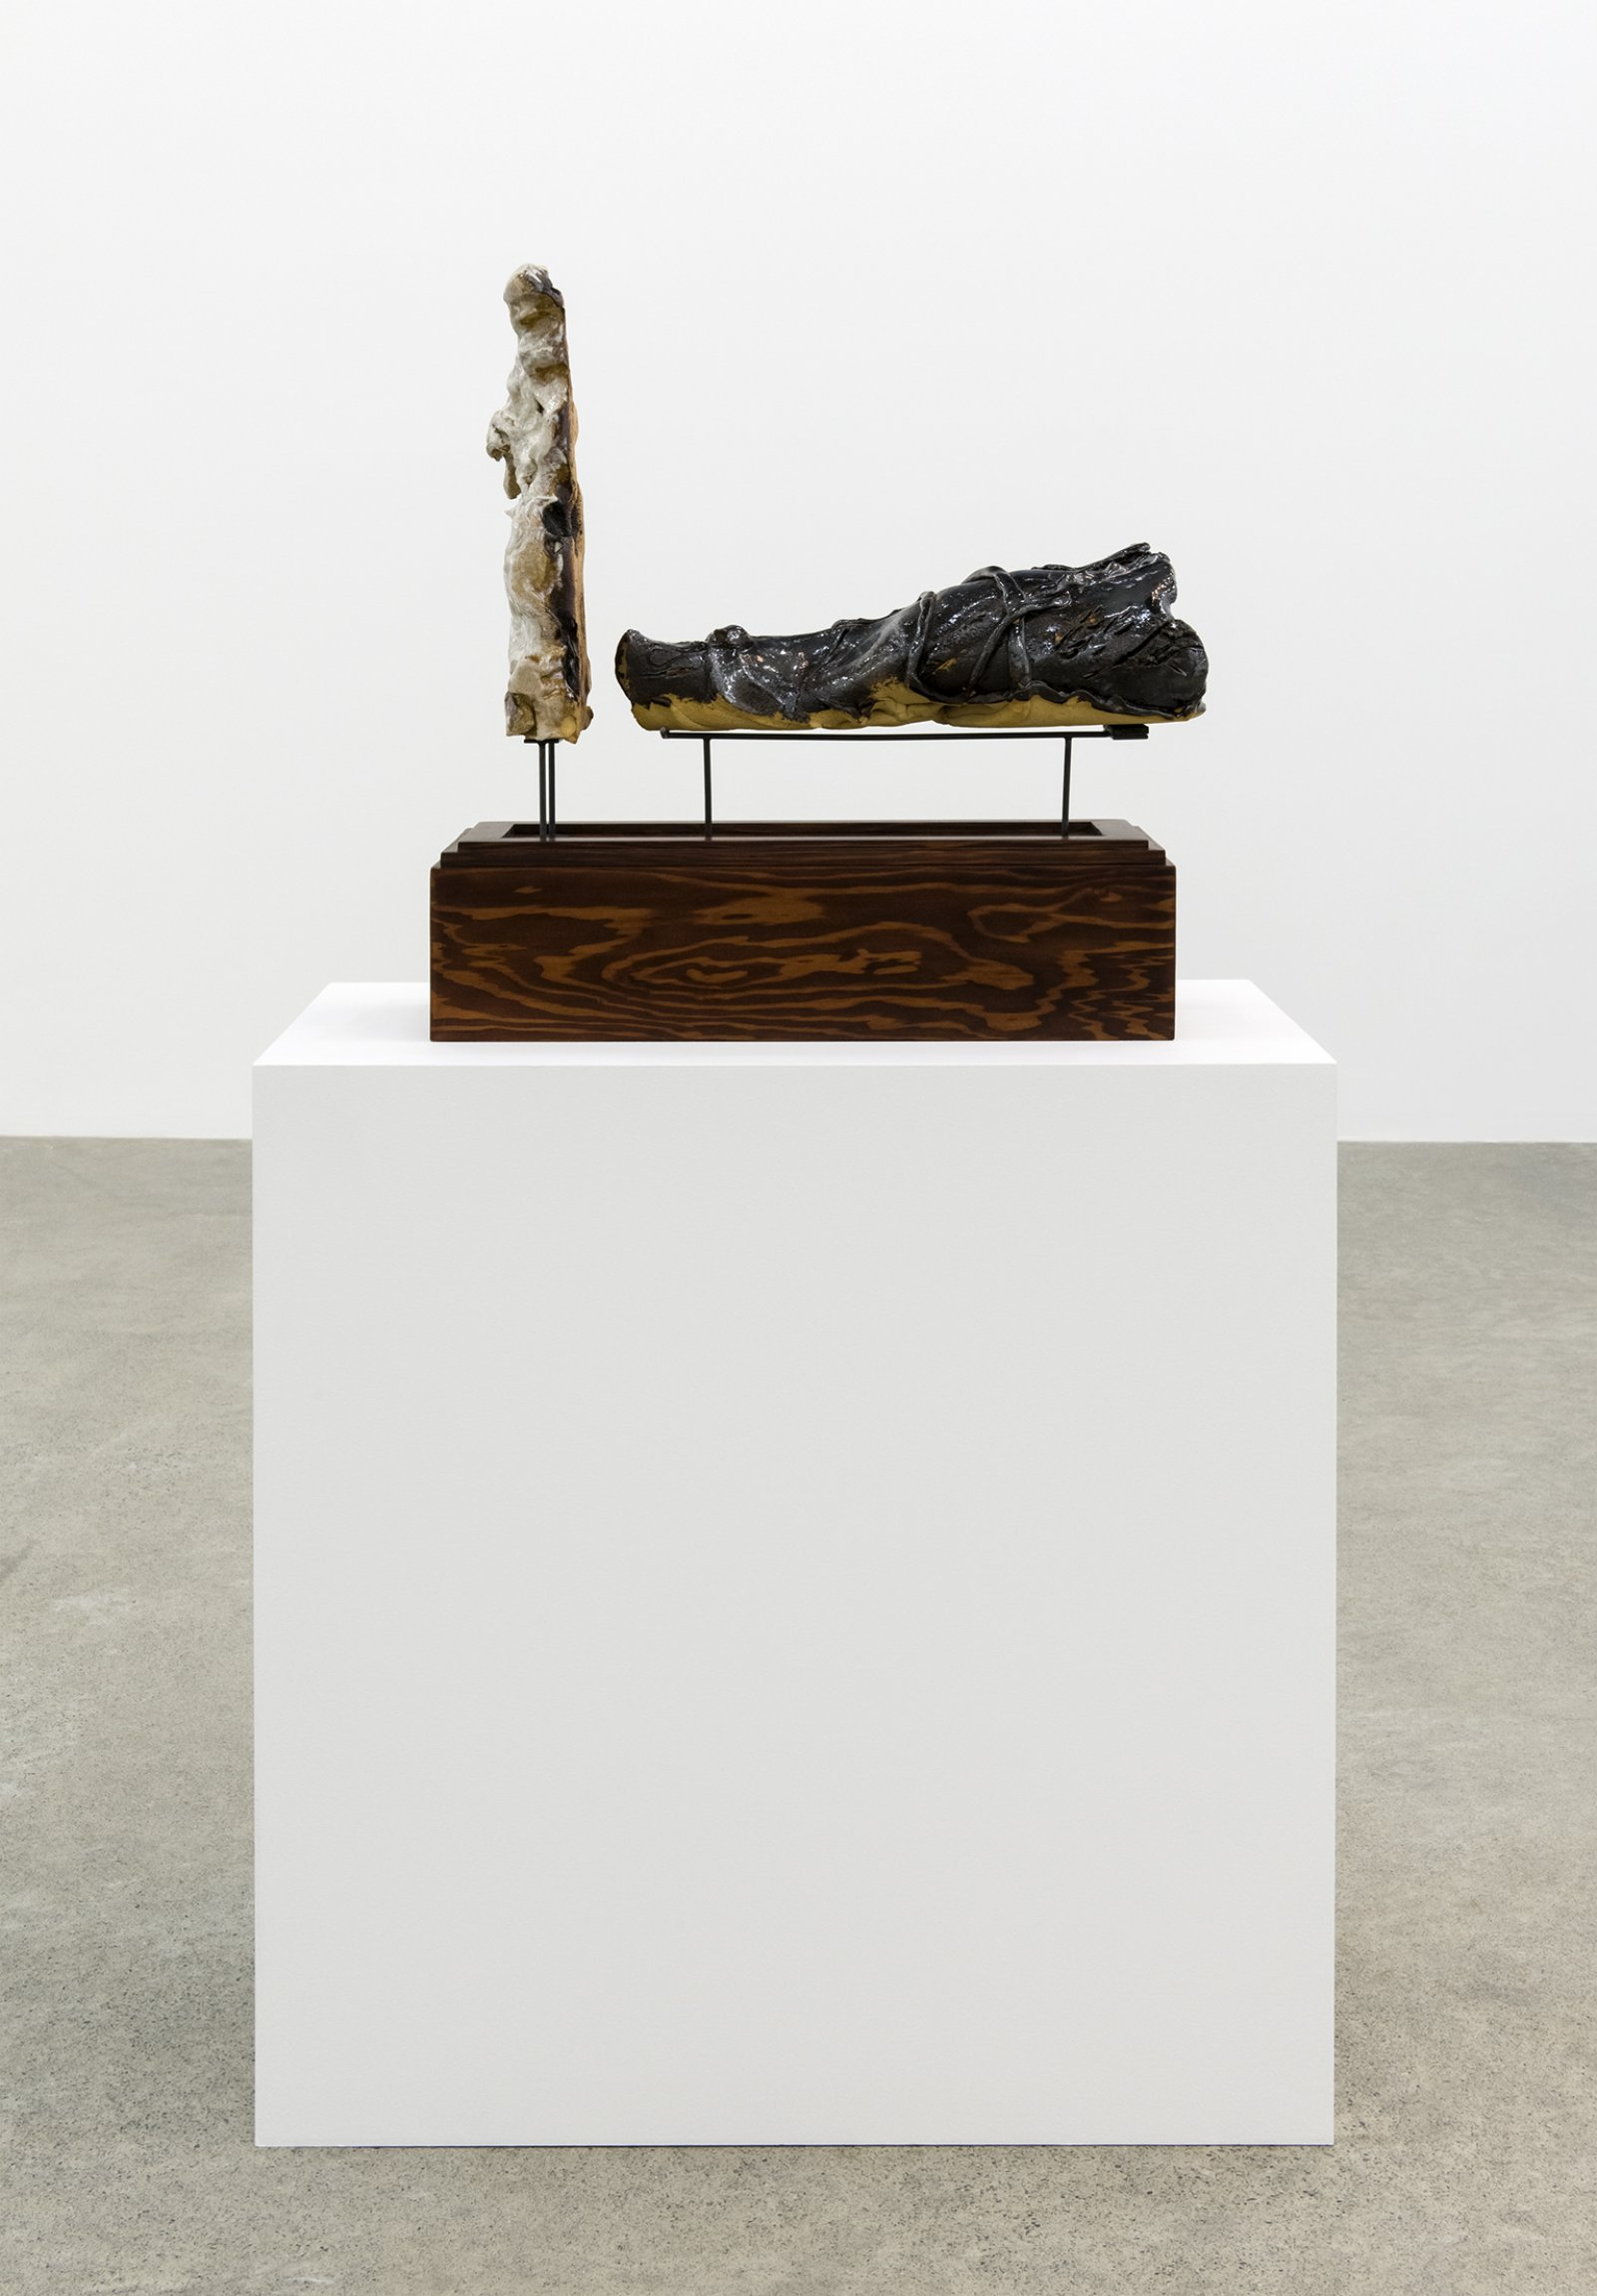 Damian Moppett, Figure with Shadow, 2016, glazed stoneware, wood, steel, 23 x 11 x 21 in. (57 x 27 x 53 cm) by Damian Moppett